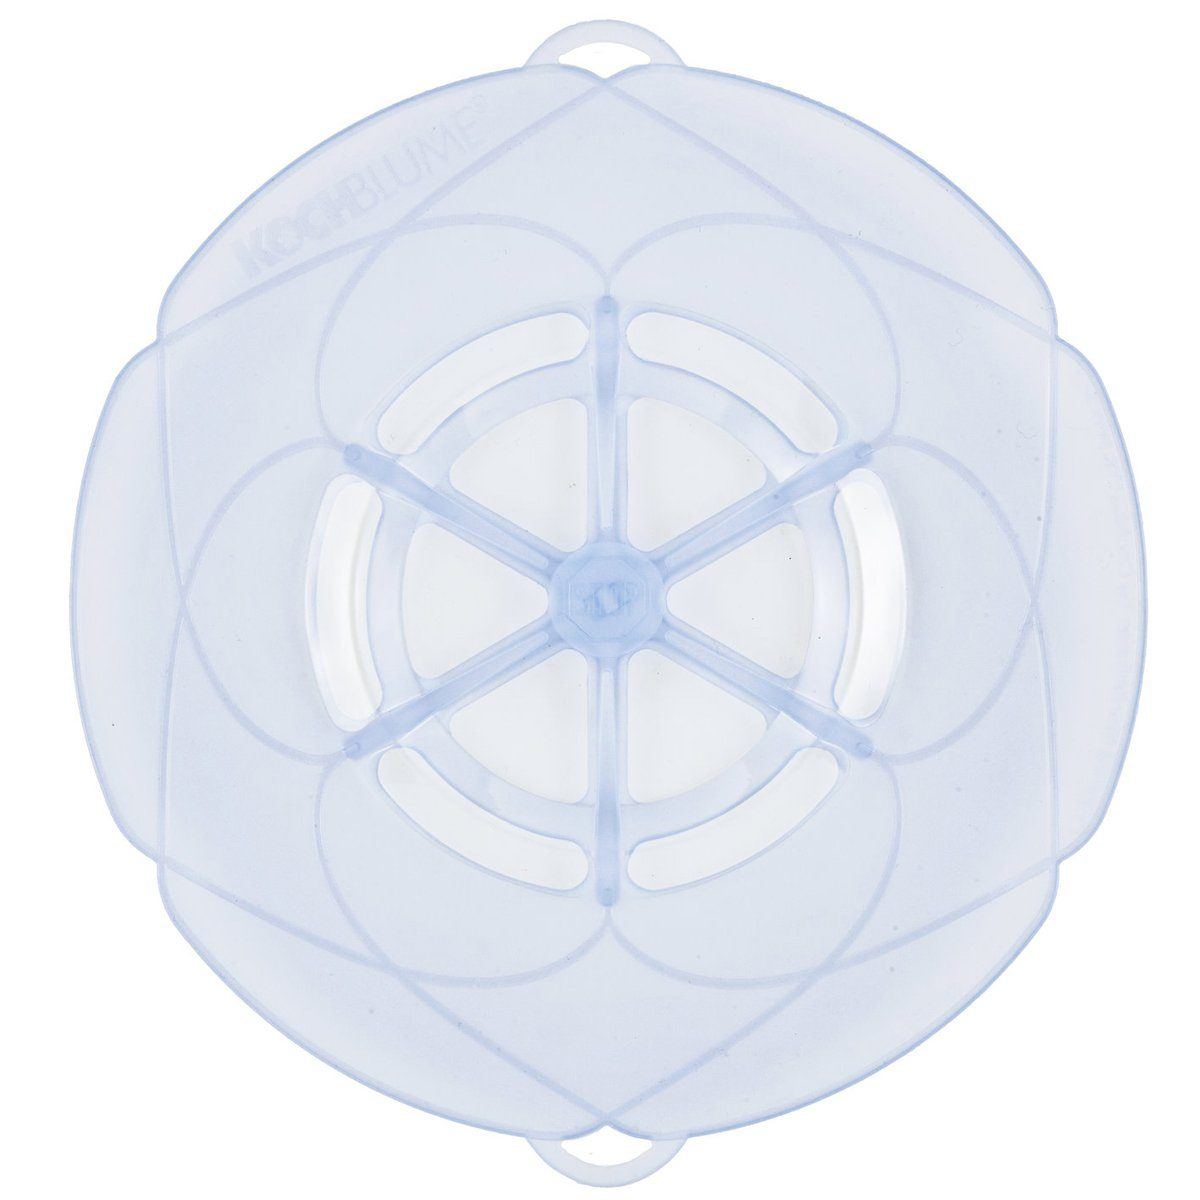 Kochblume Kochblume Überkochschutz eisblau 33 cm